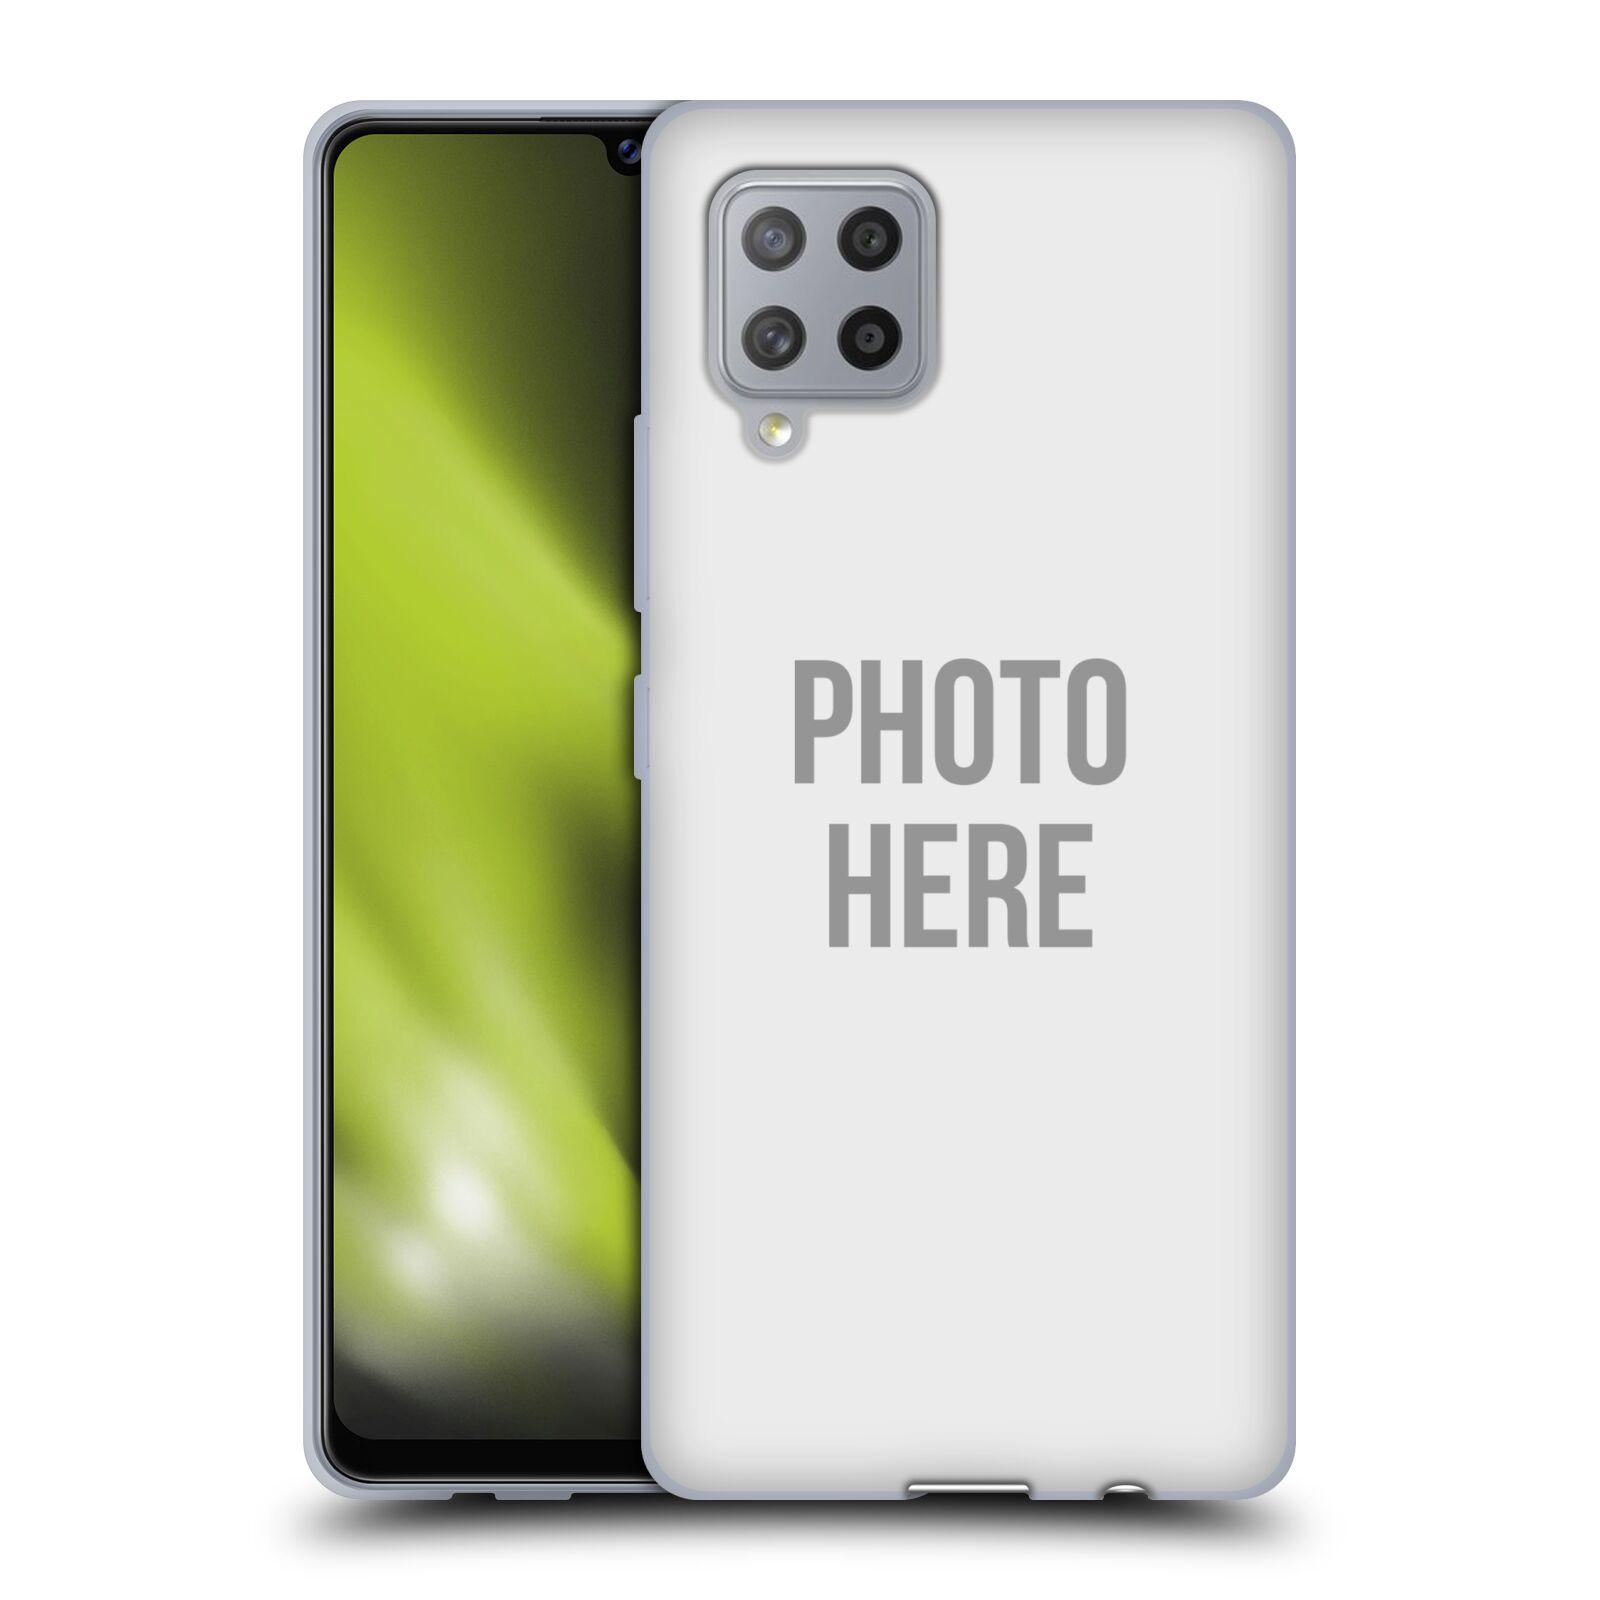 Silikonové pouzdro na mobil Samsung Galaxy A42 5G s vlastním motivem